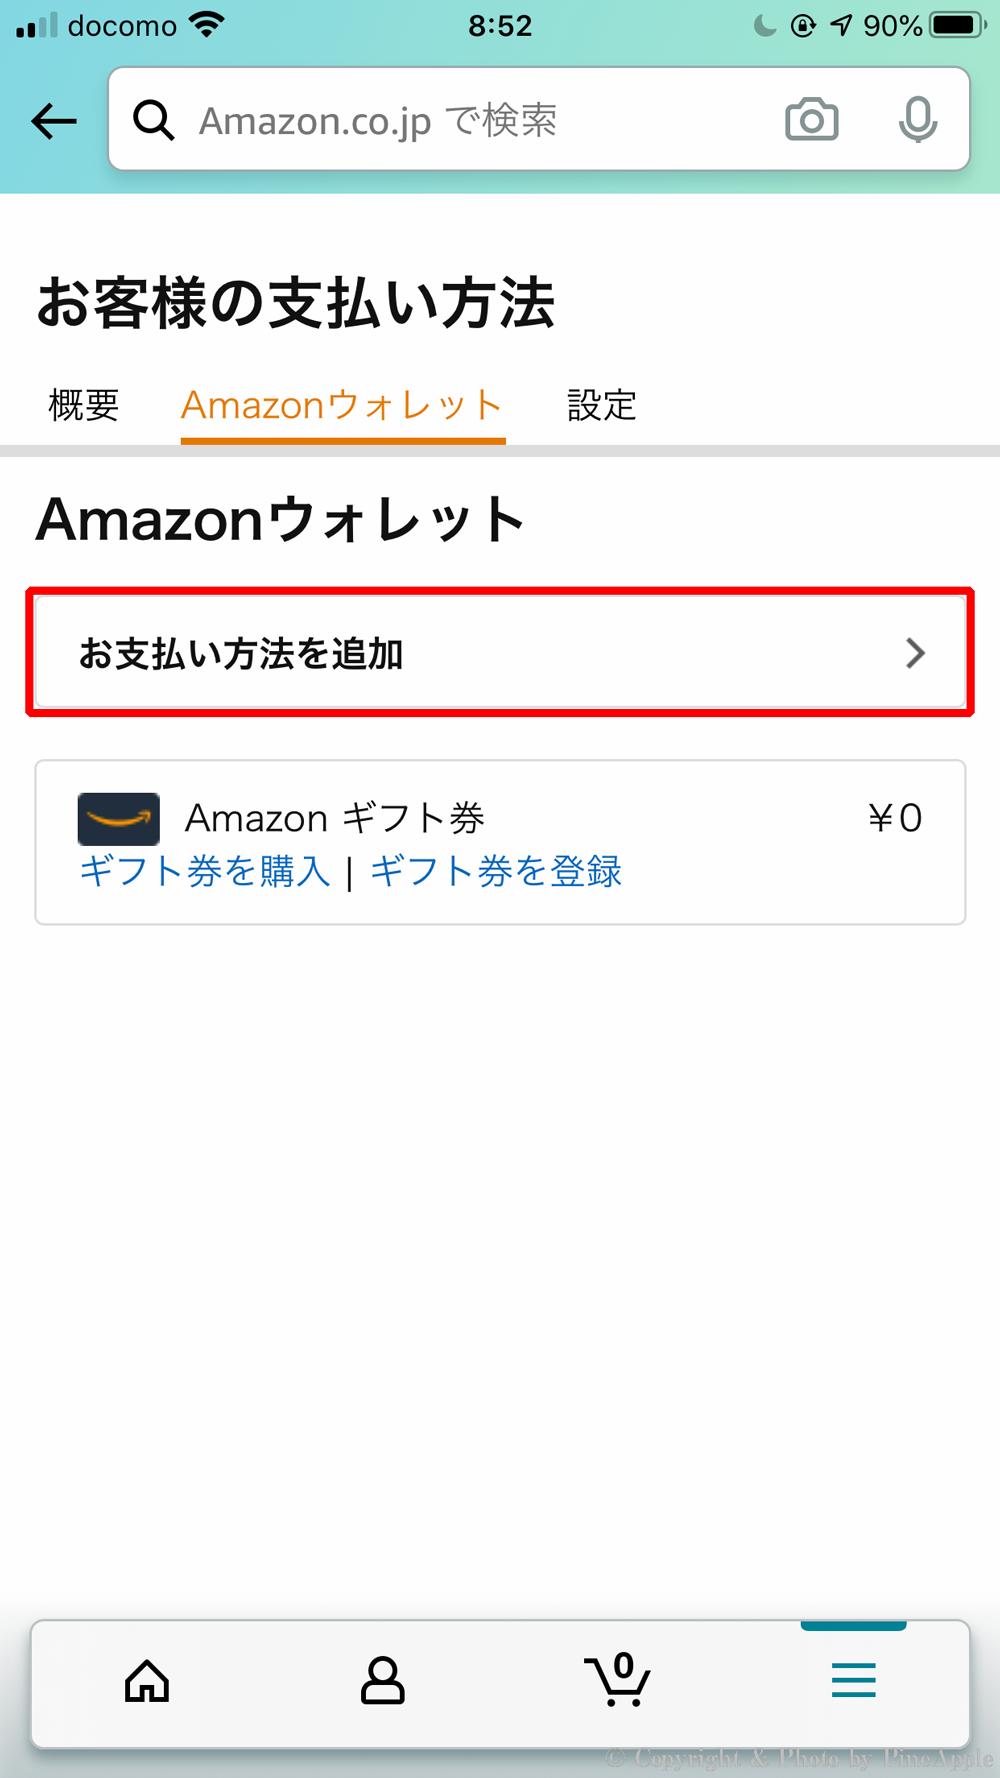 Amazon ショッピングアプリ:「お支払い方法を追加」をタップ